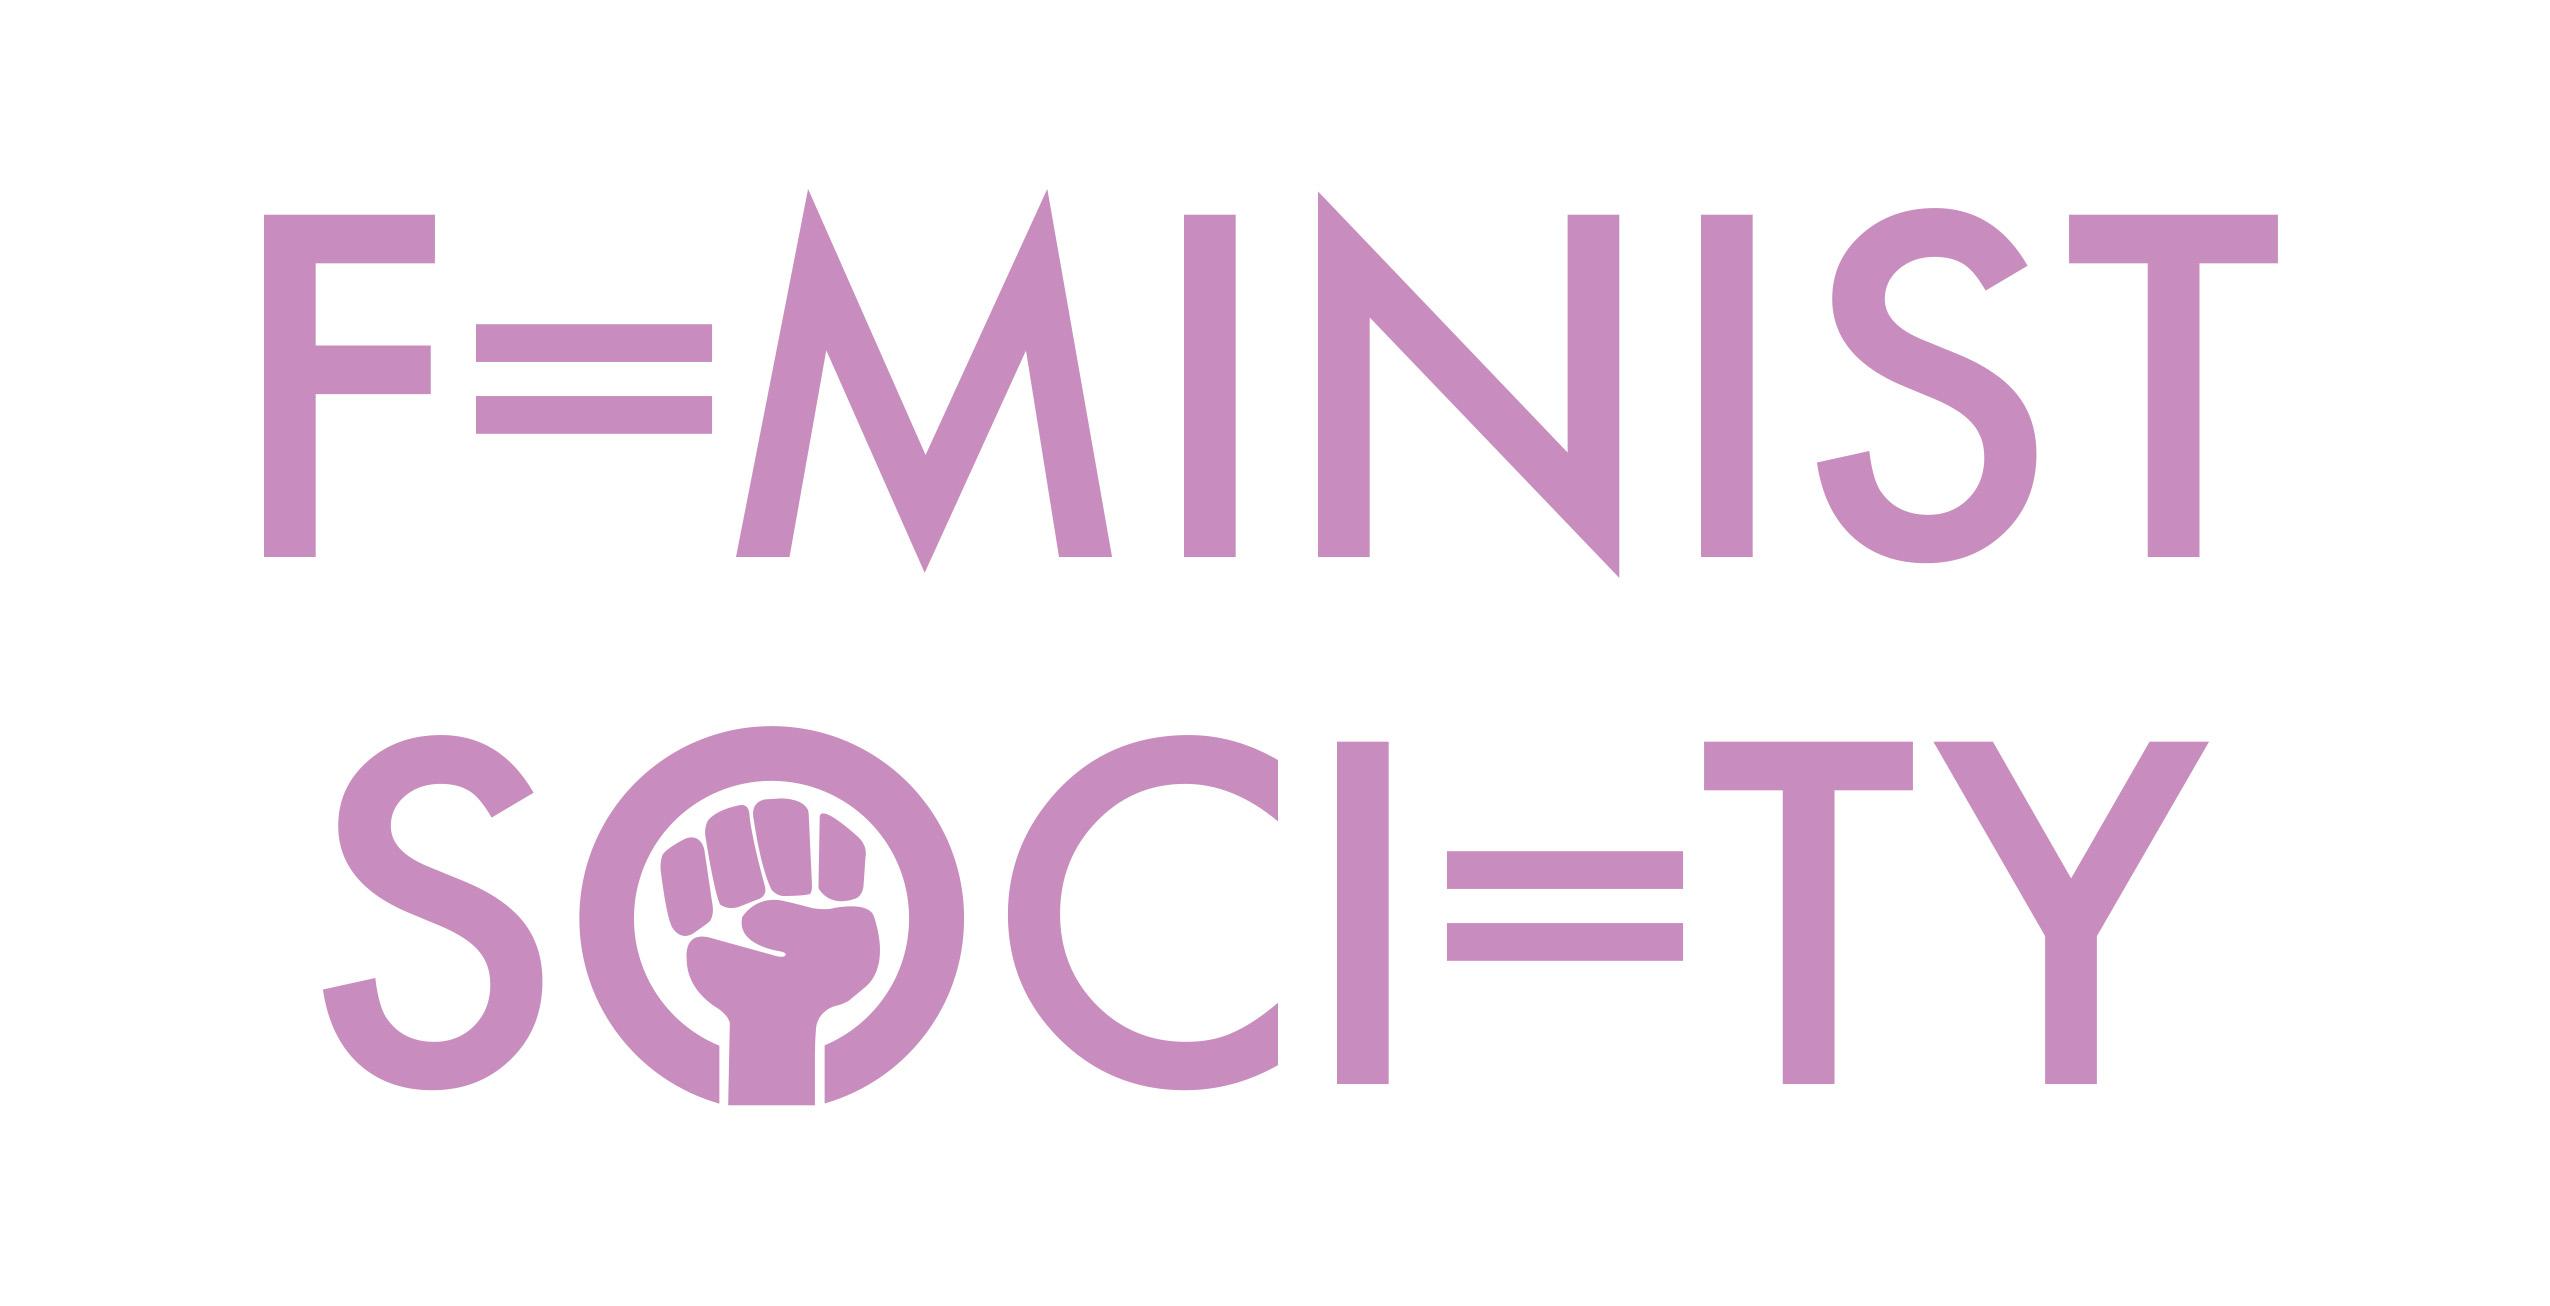 Feminist Society logo